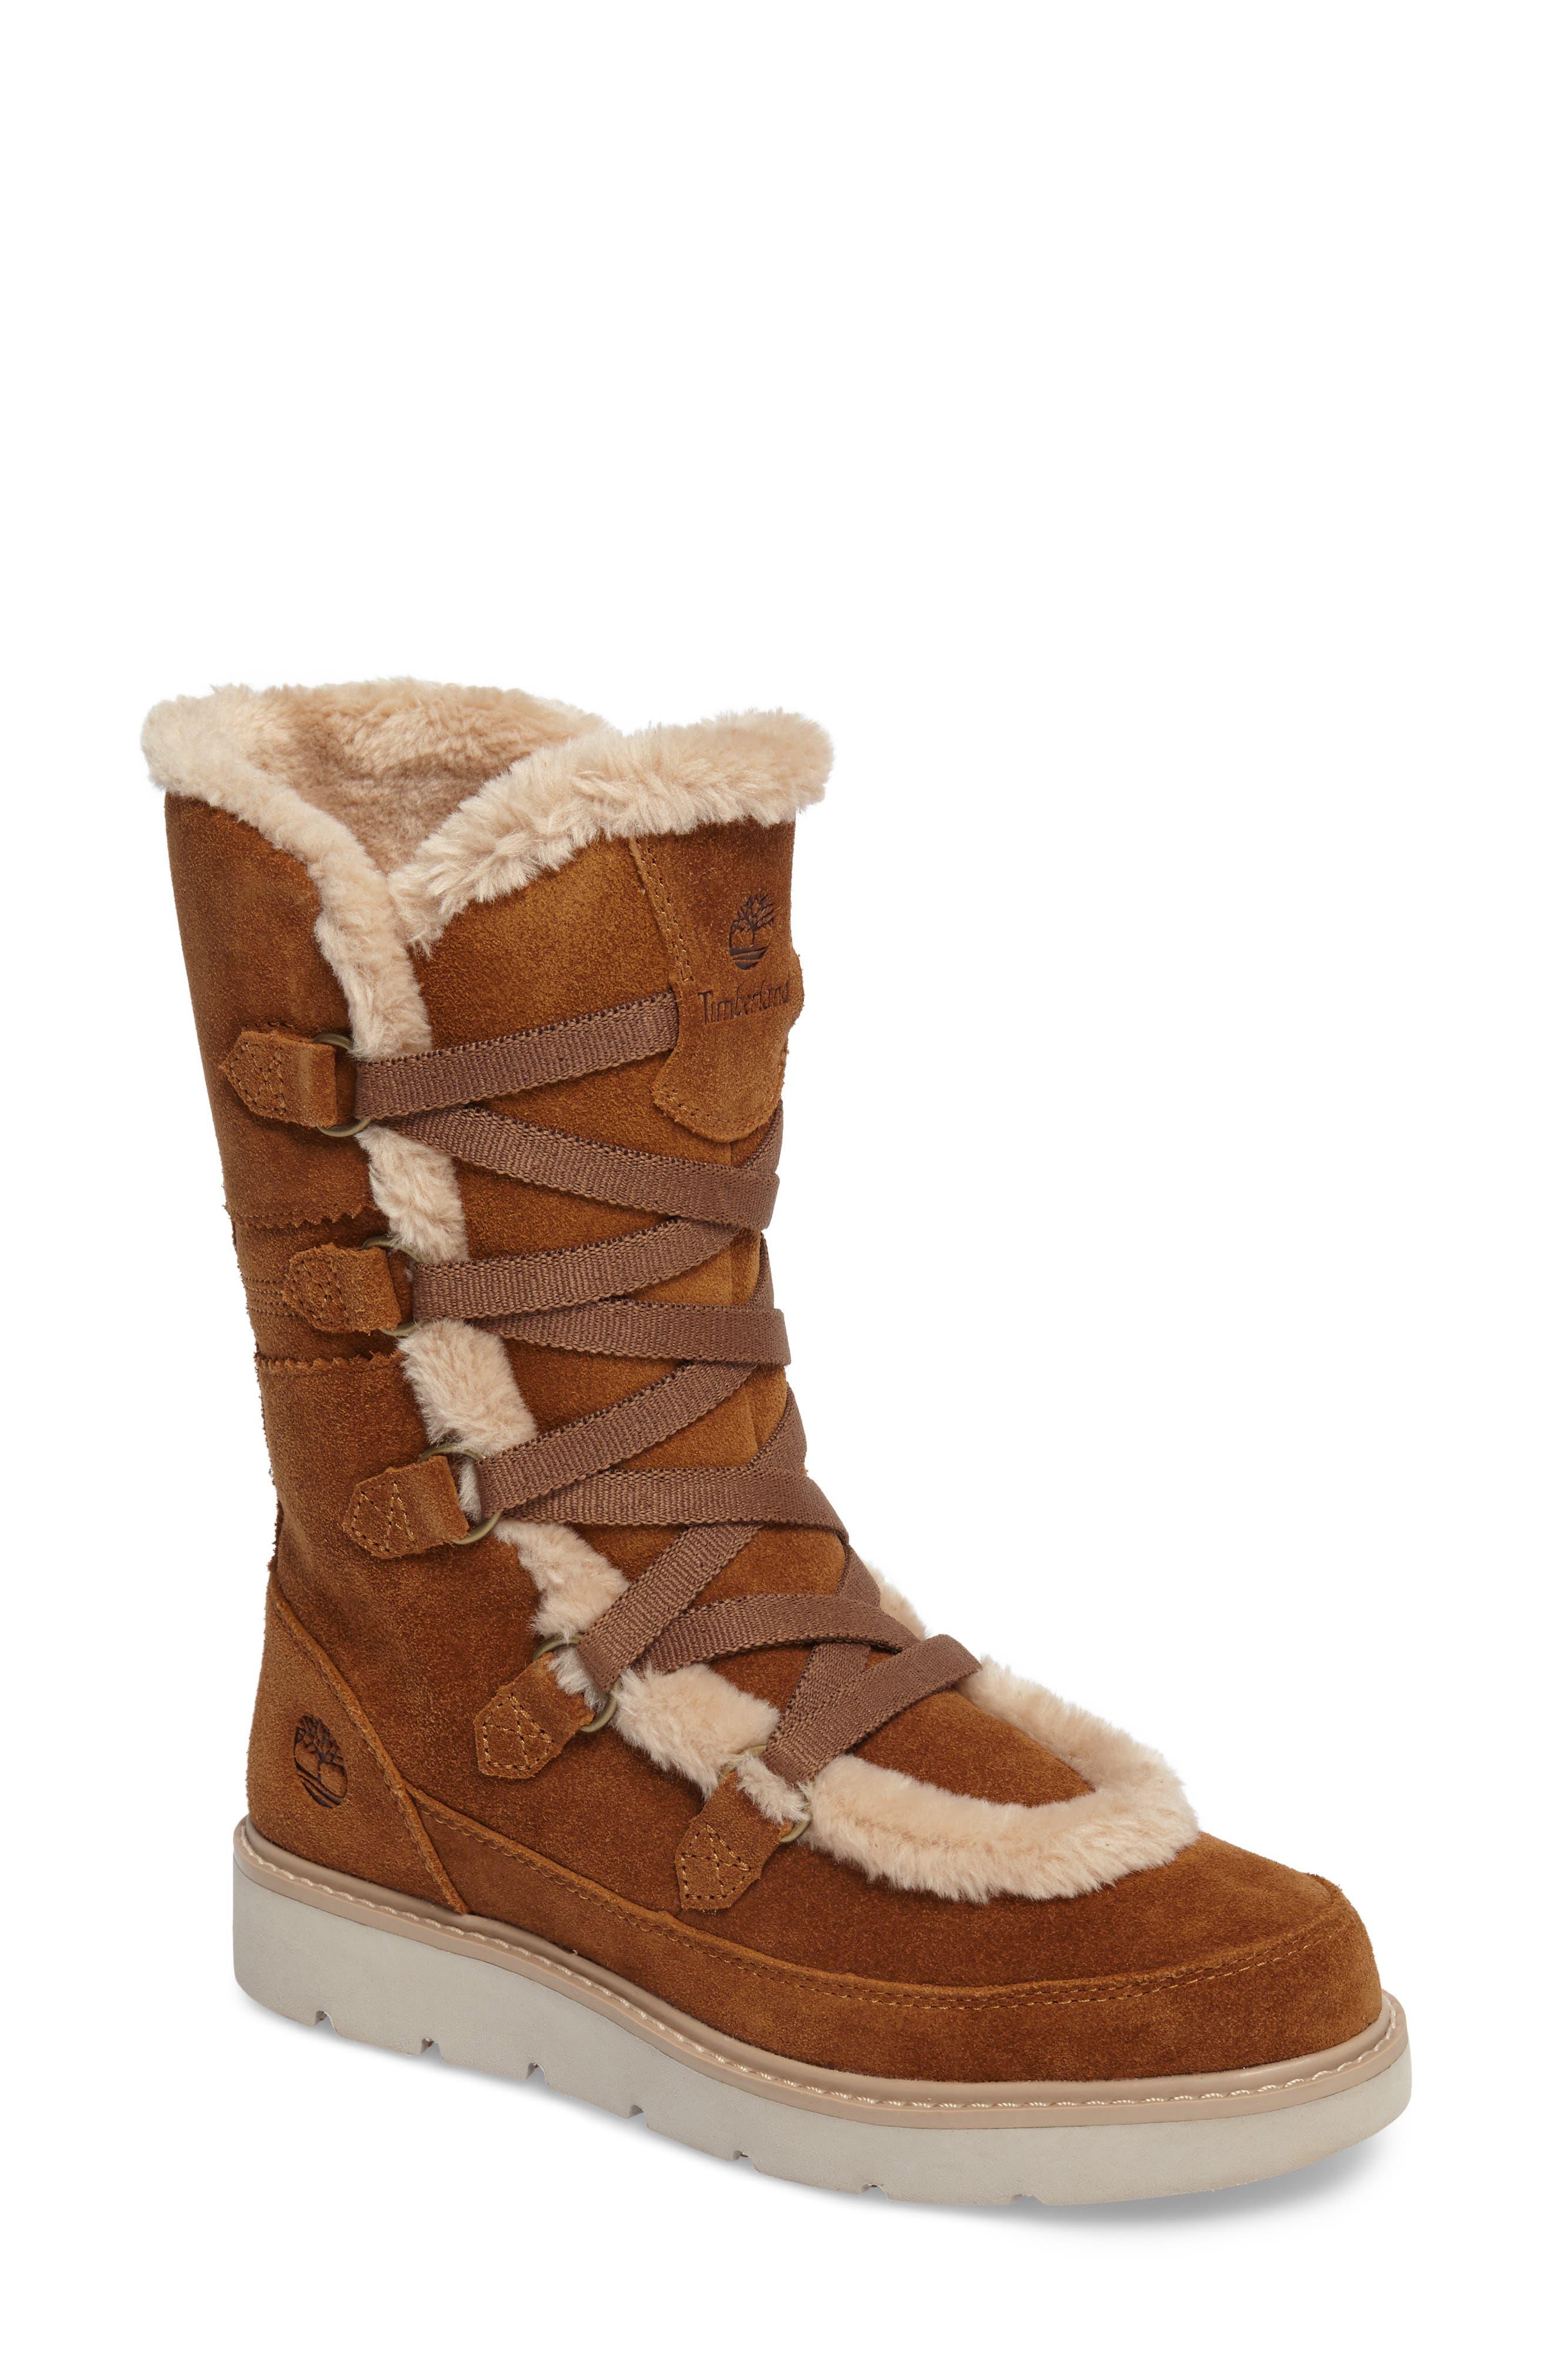 Alternate Image 1 Selected - Timberland Kenniston Faux Fur Water Resistant Mukluk Boot (Women)